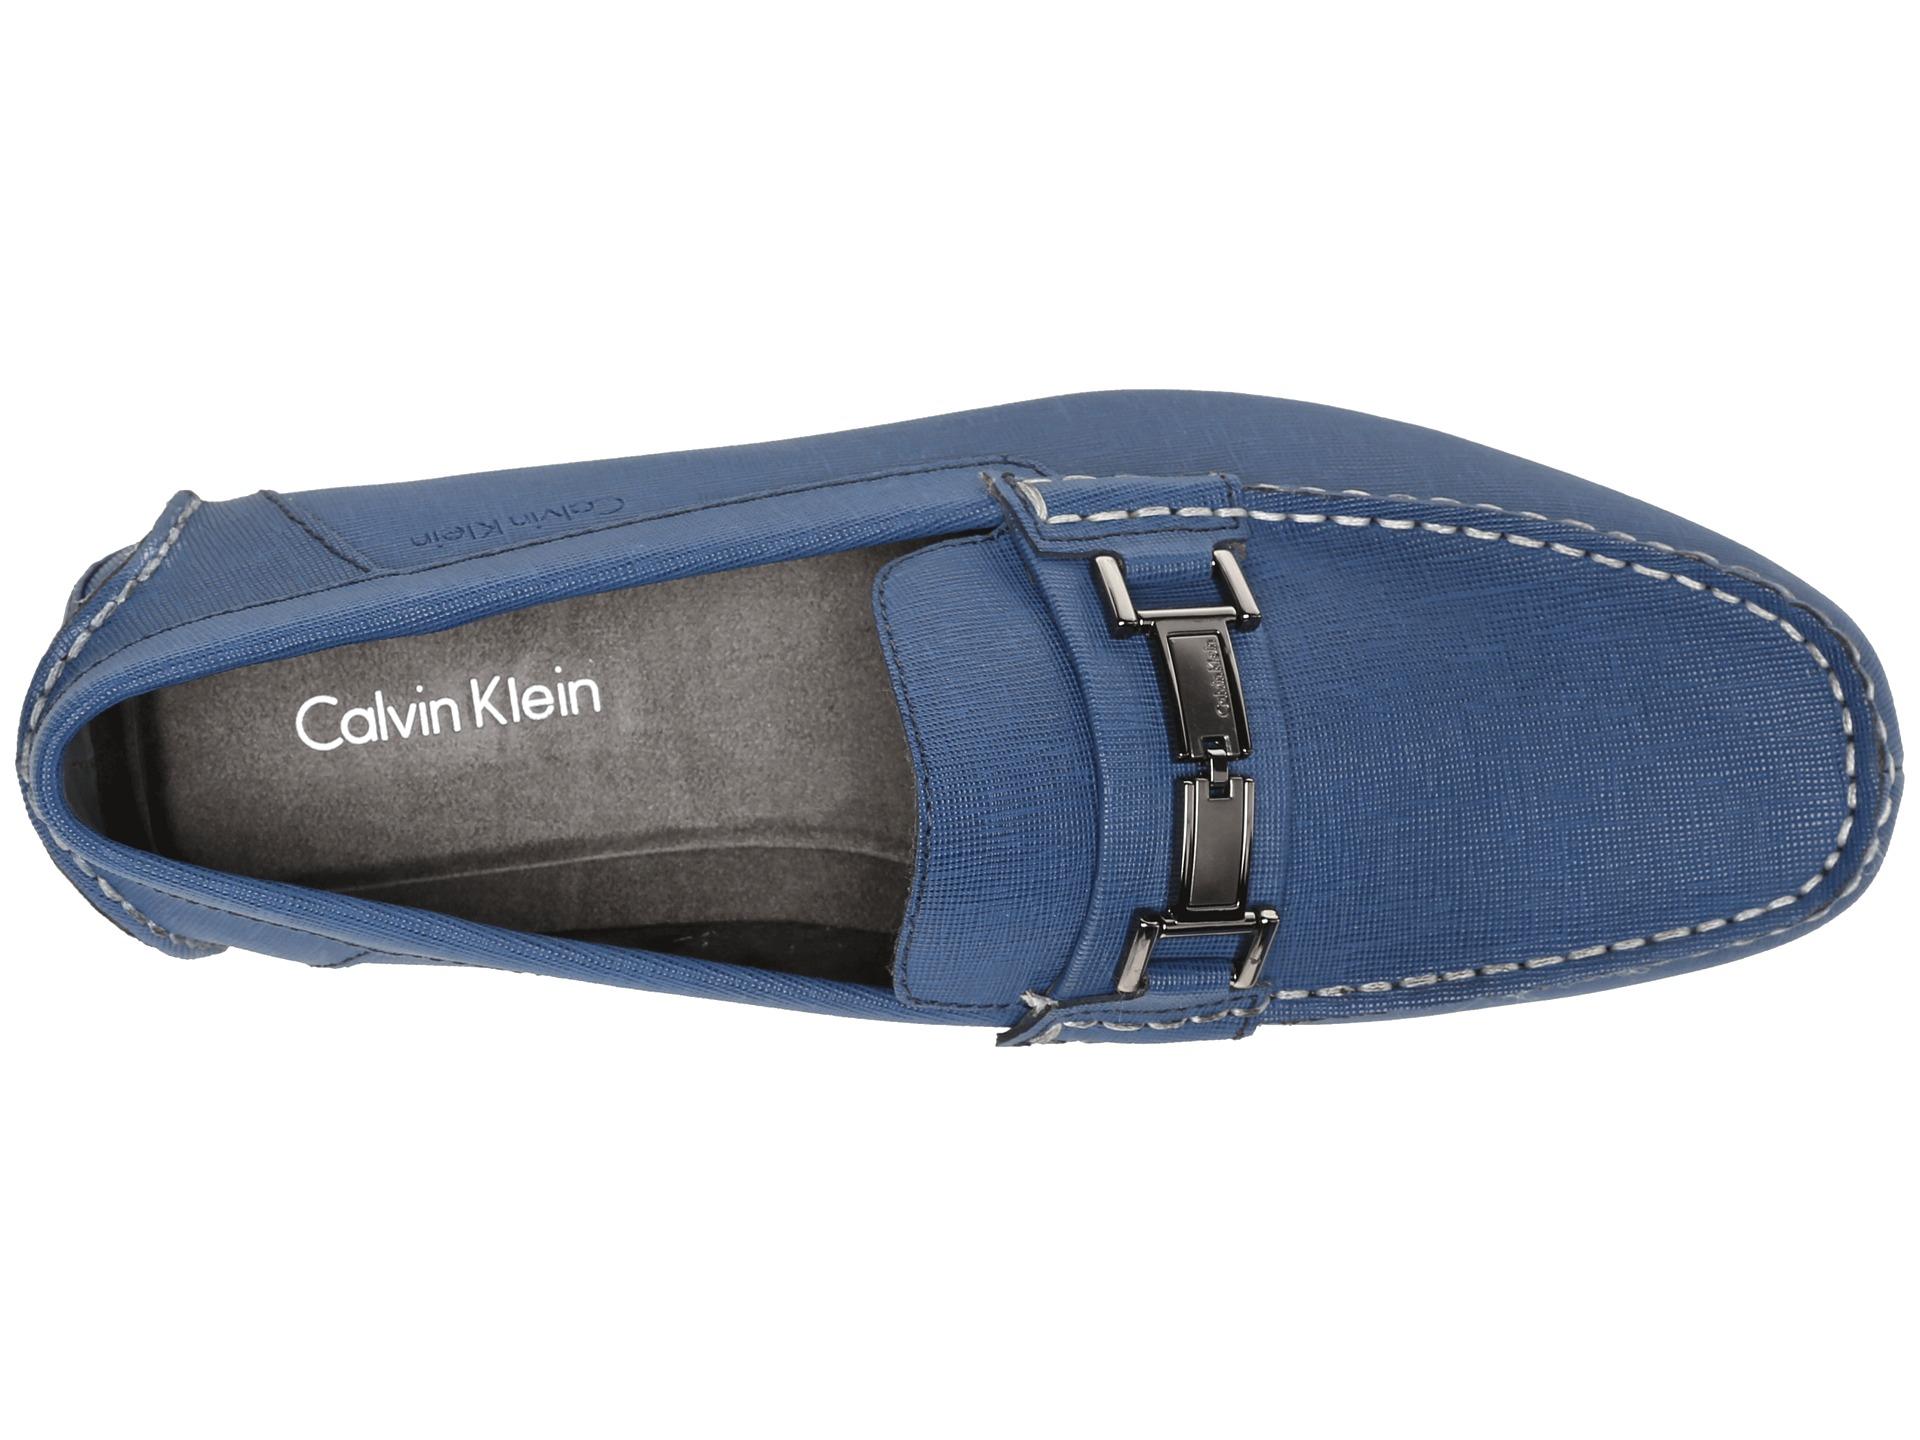 e7417c8129b Lyst - Calvin Klein Magnus in Blue for Men